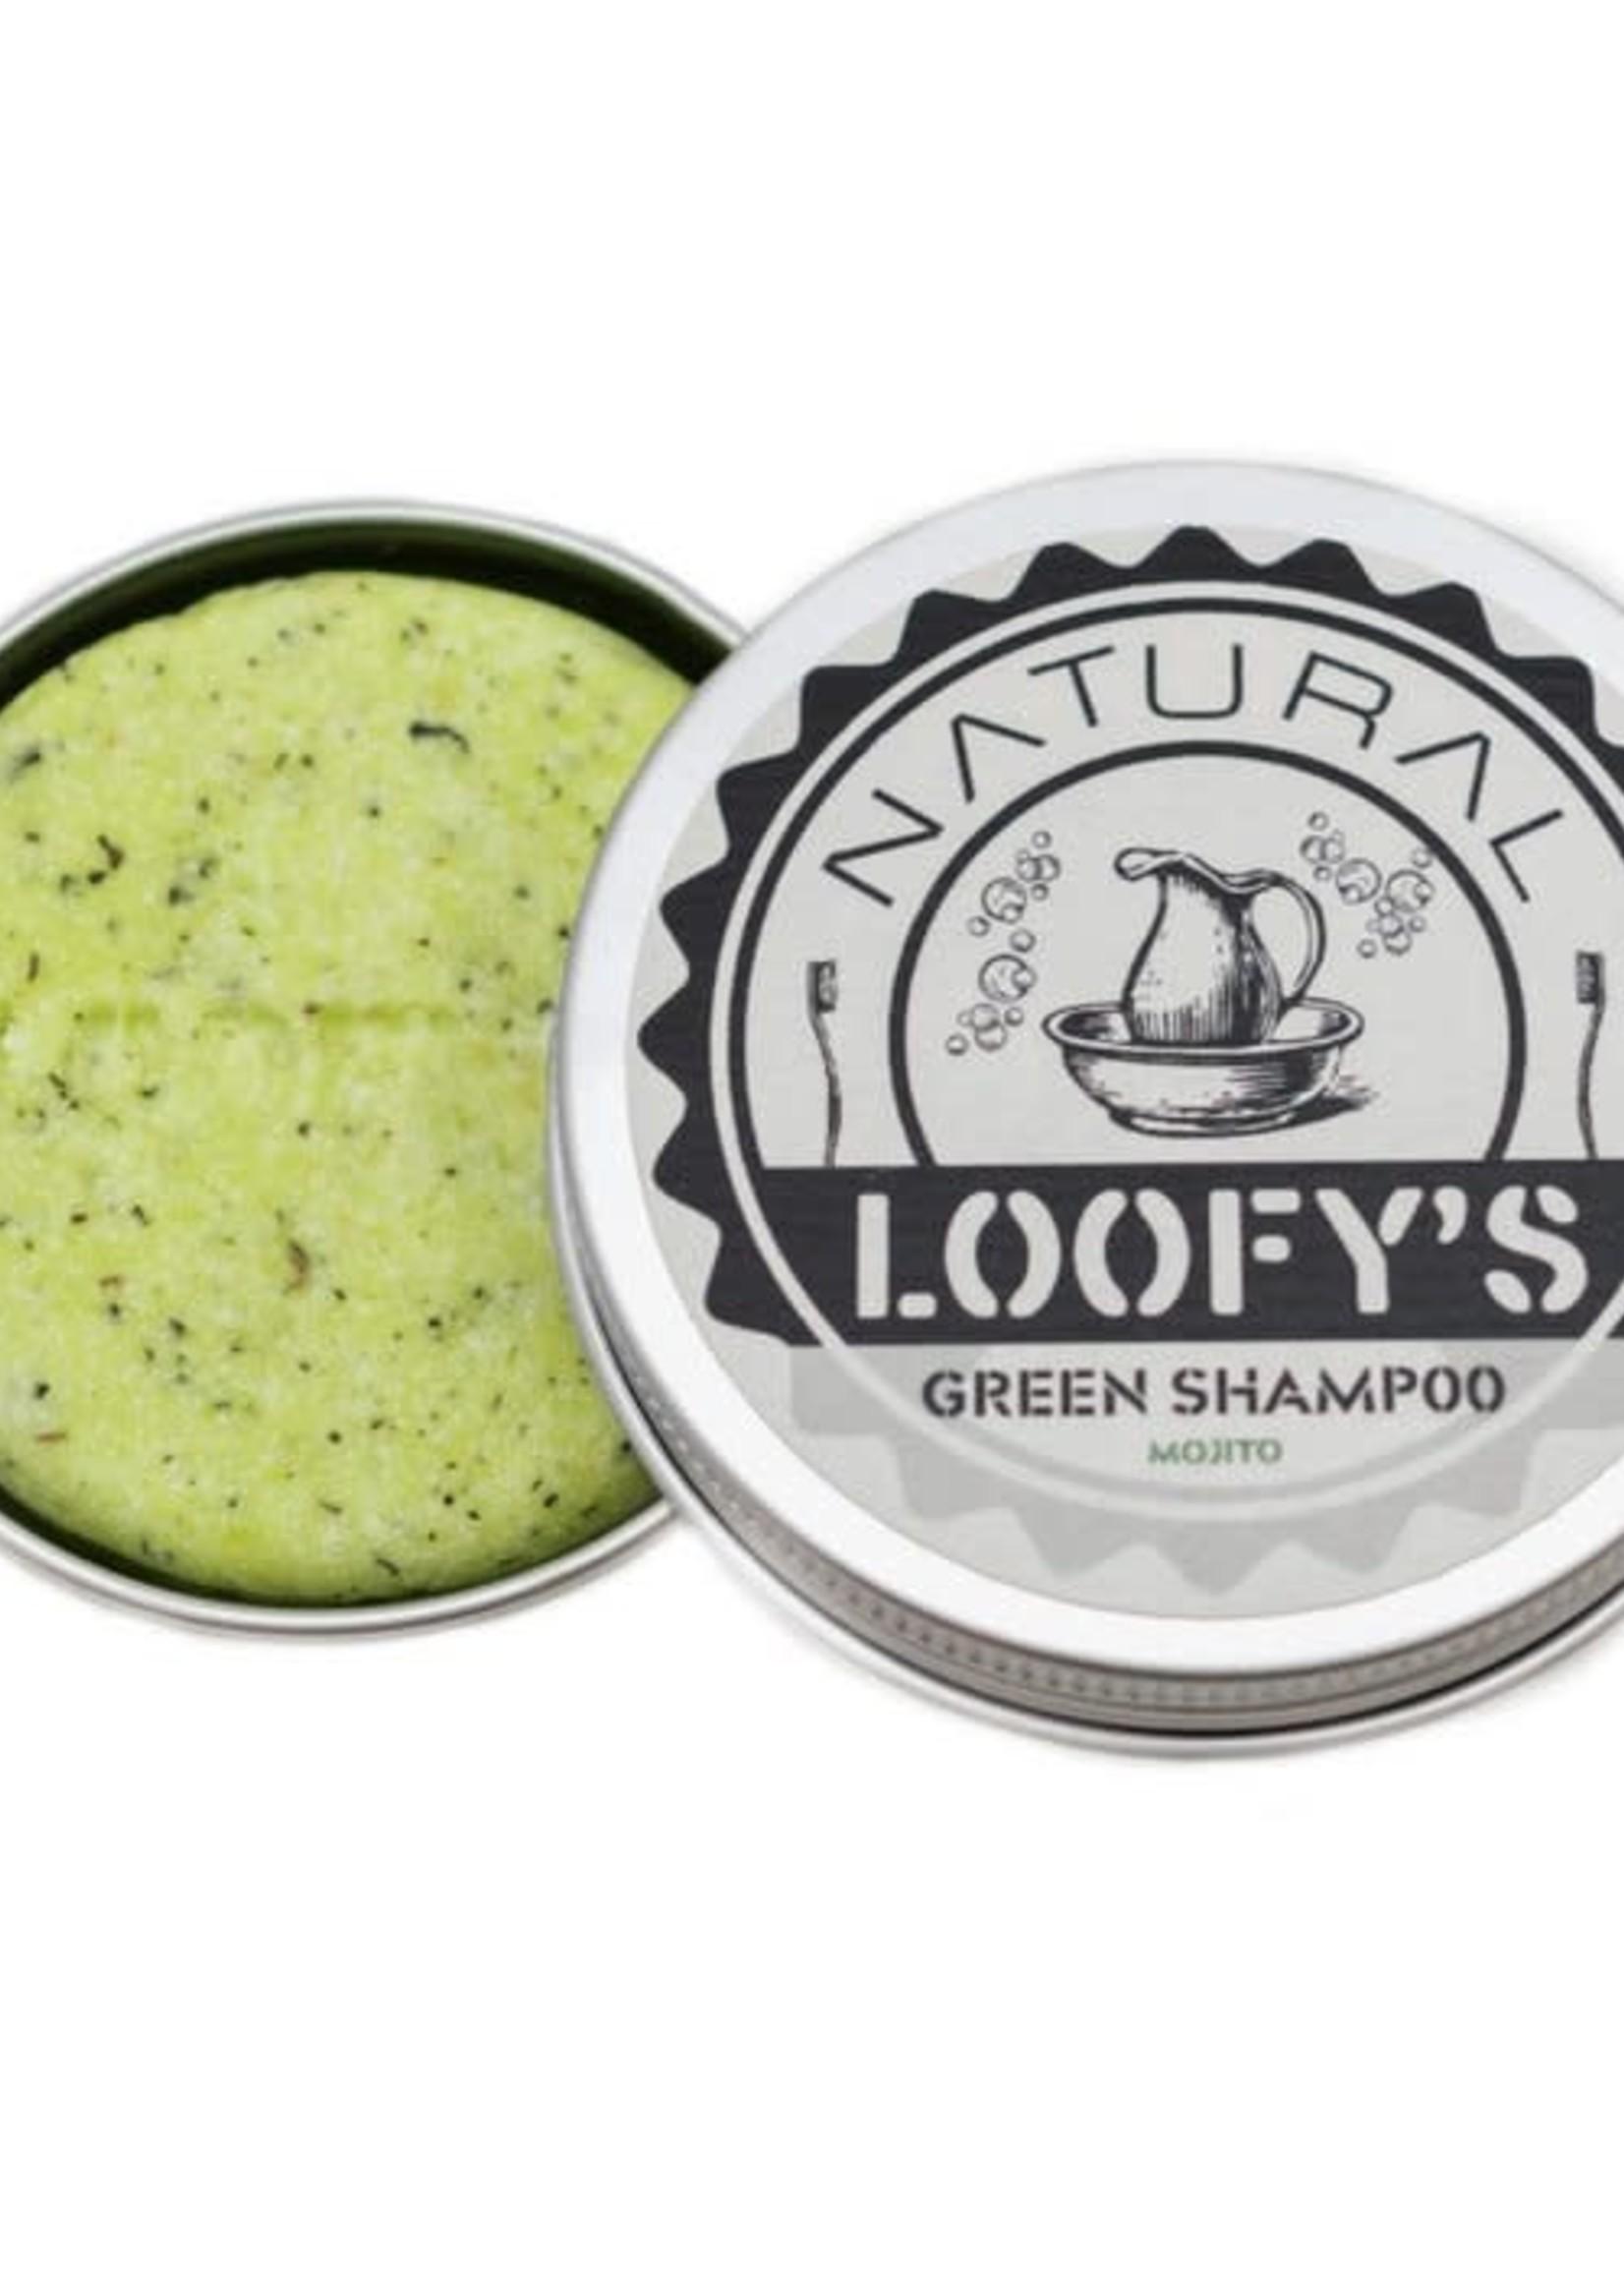 Loofy's Loofy's Shampoo Bar - Green met bakje - normaal tot droog haar